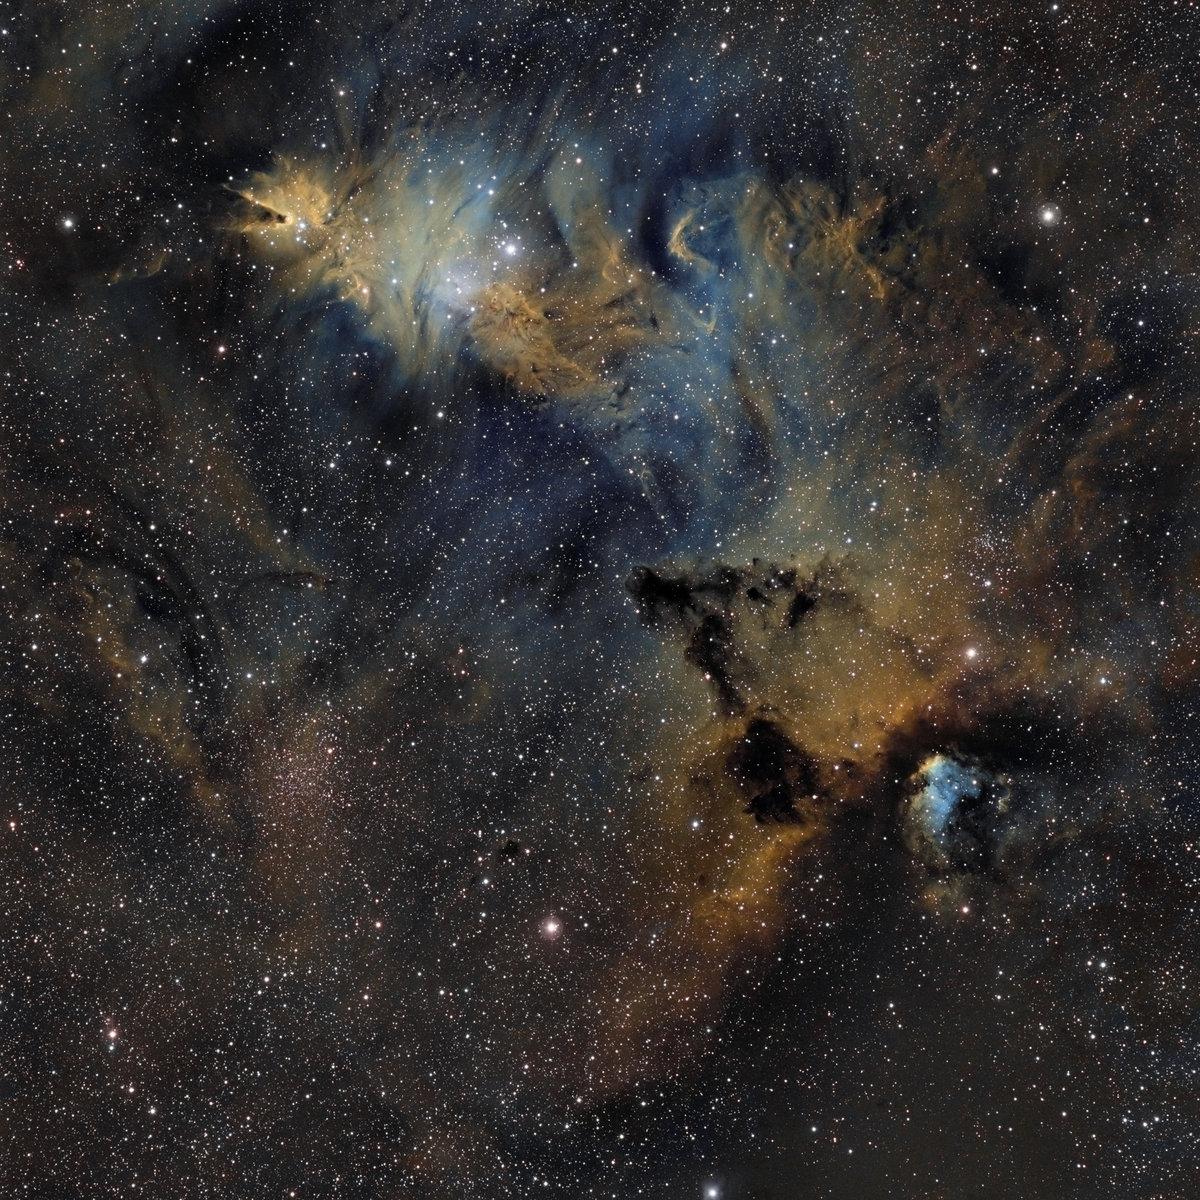 5aaa6405649d8_NGC2264HSOv21800j.thumb.jpg.21215442016f6fcdccf560115f801d84.jpg